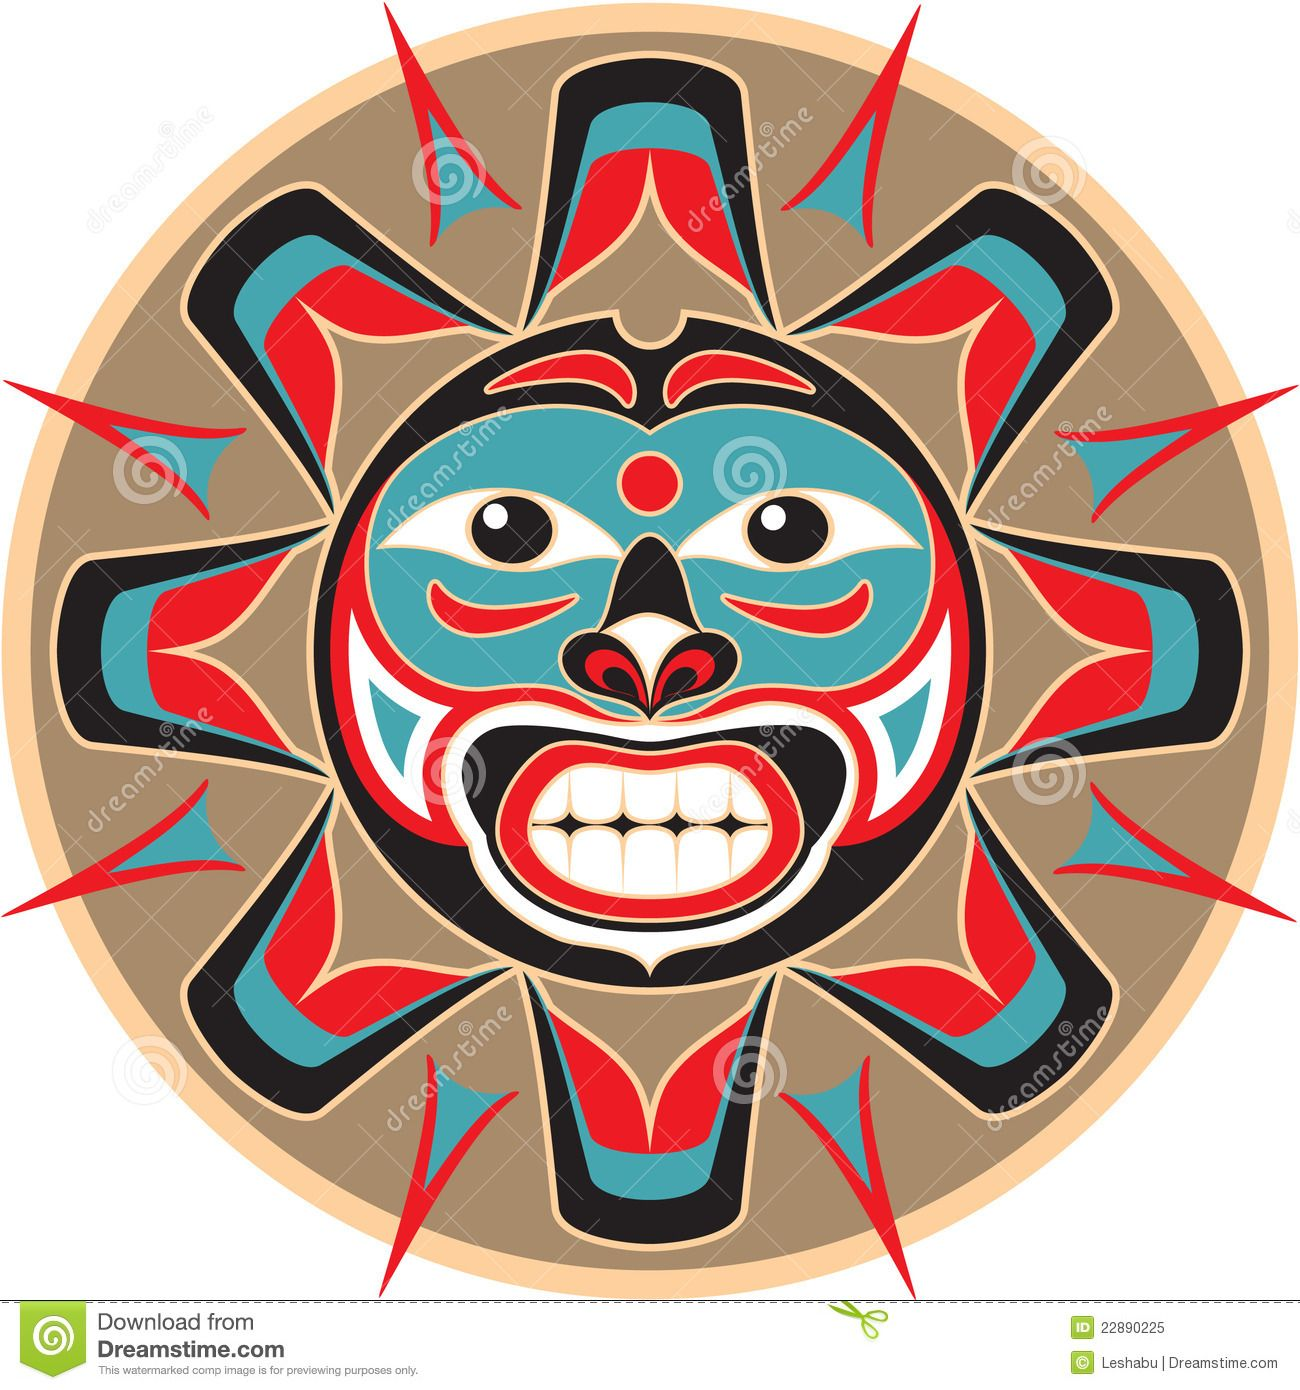 american indian art designs - Google Search